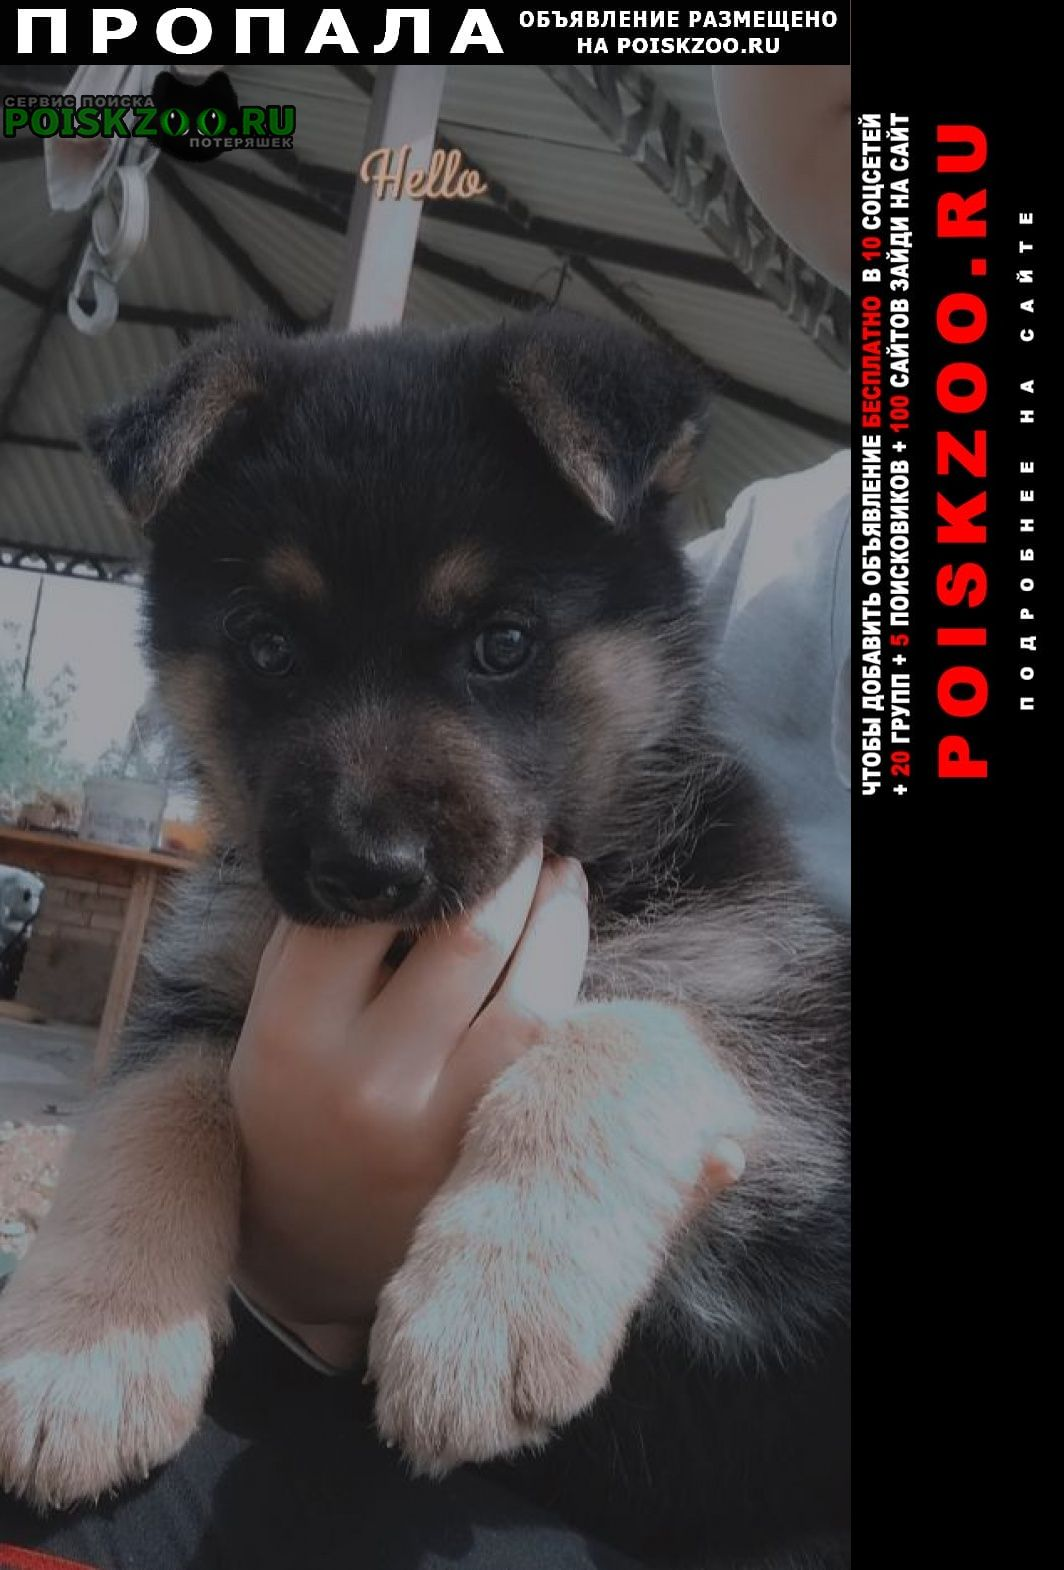 Пропала собака кобель метис немецкой овчарки Краснодар